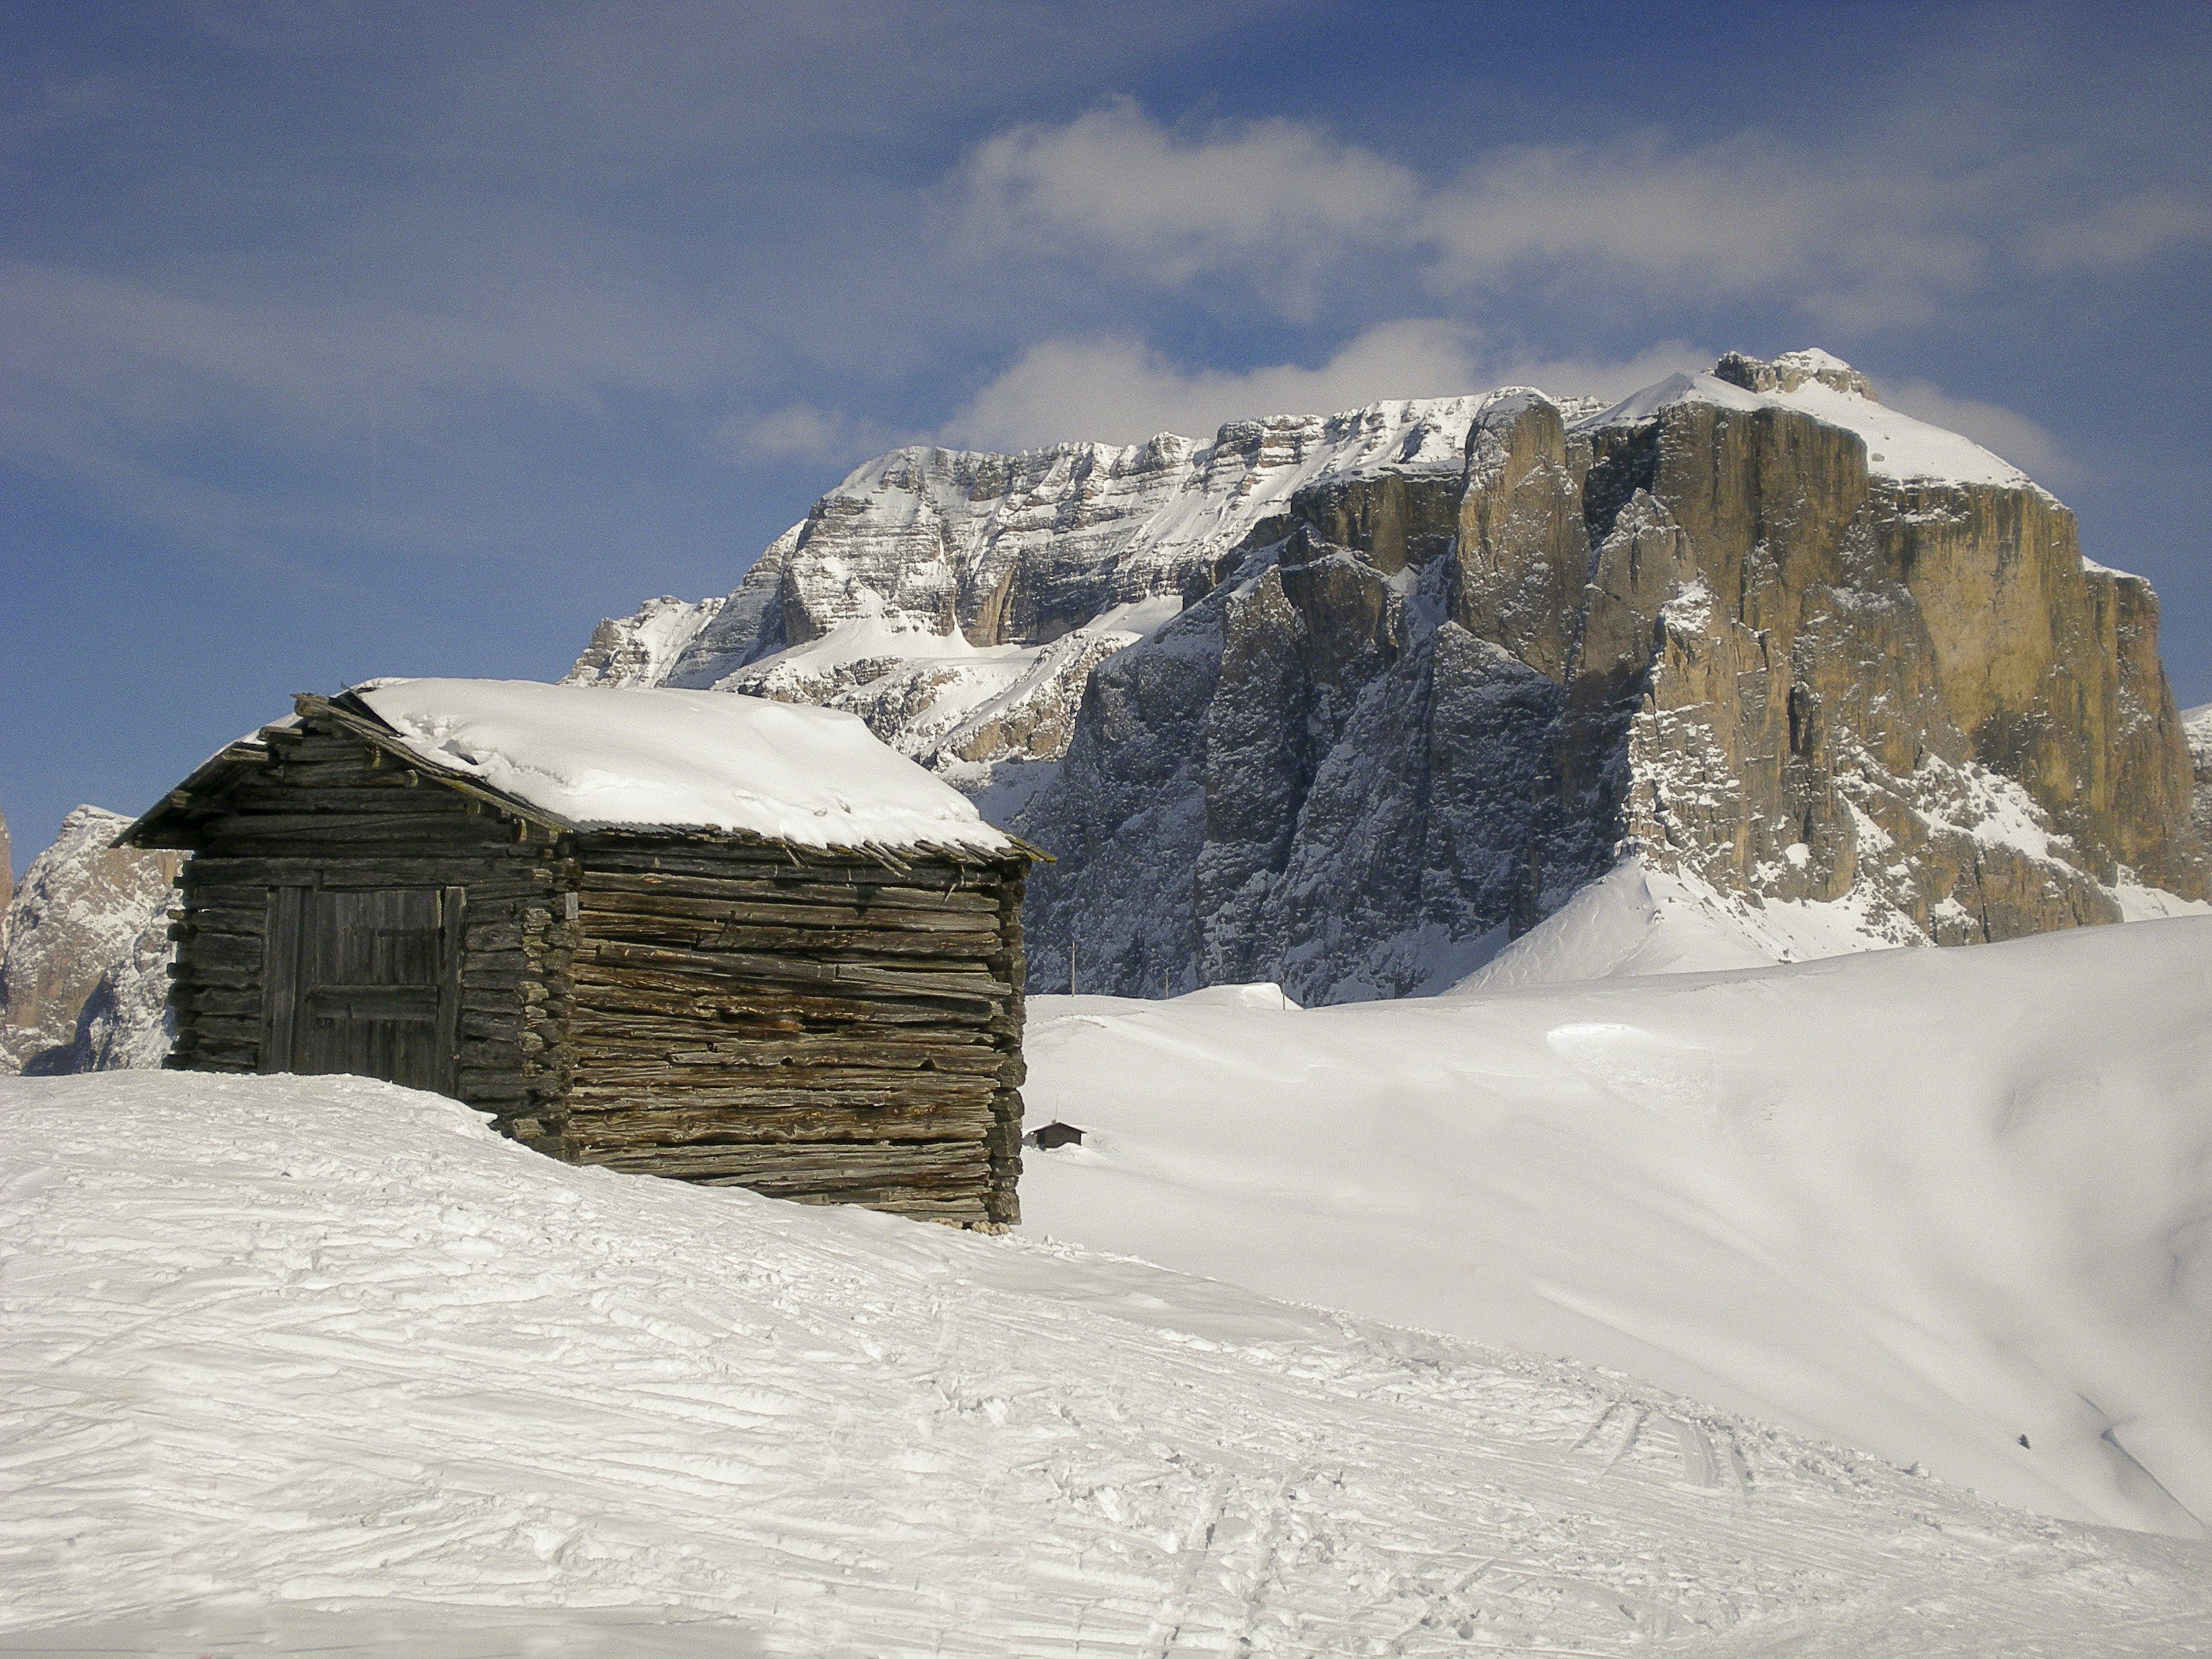 Free stock photo of alto adige, dolomiti, hut, mountain